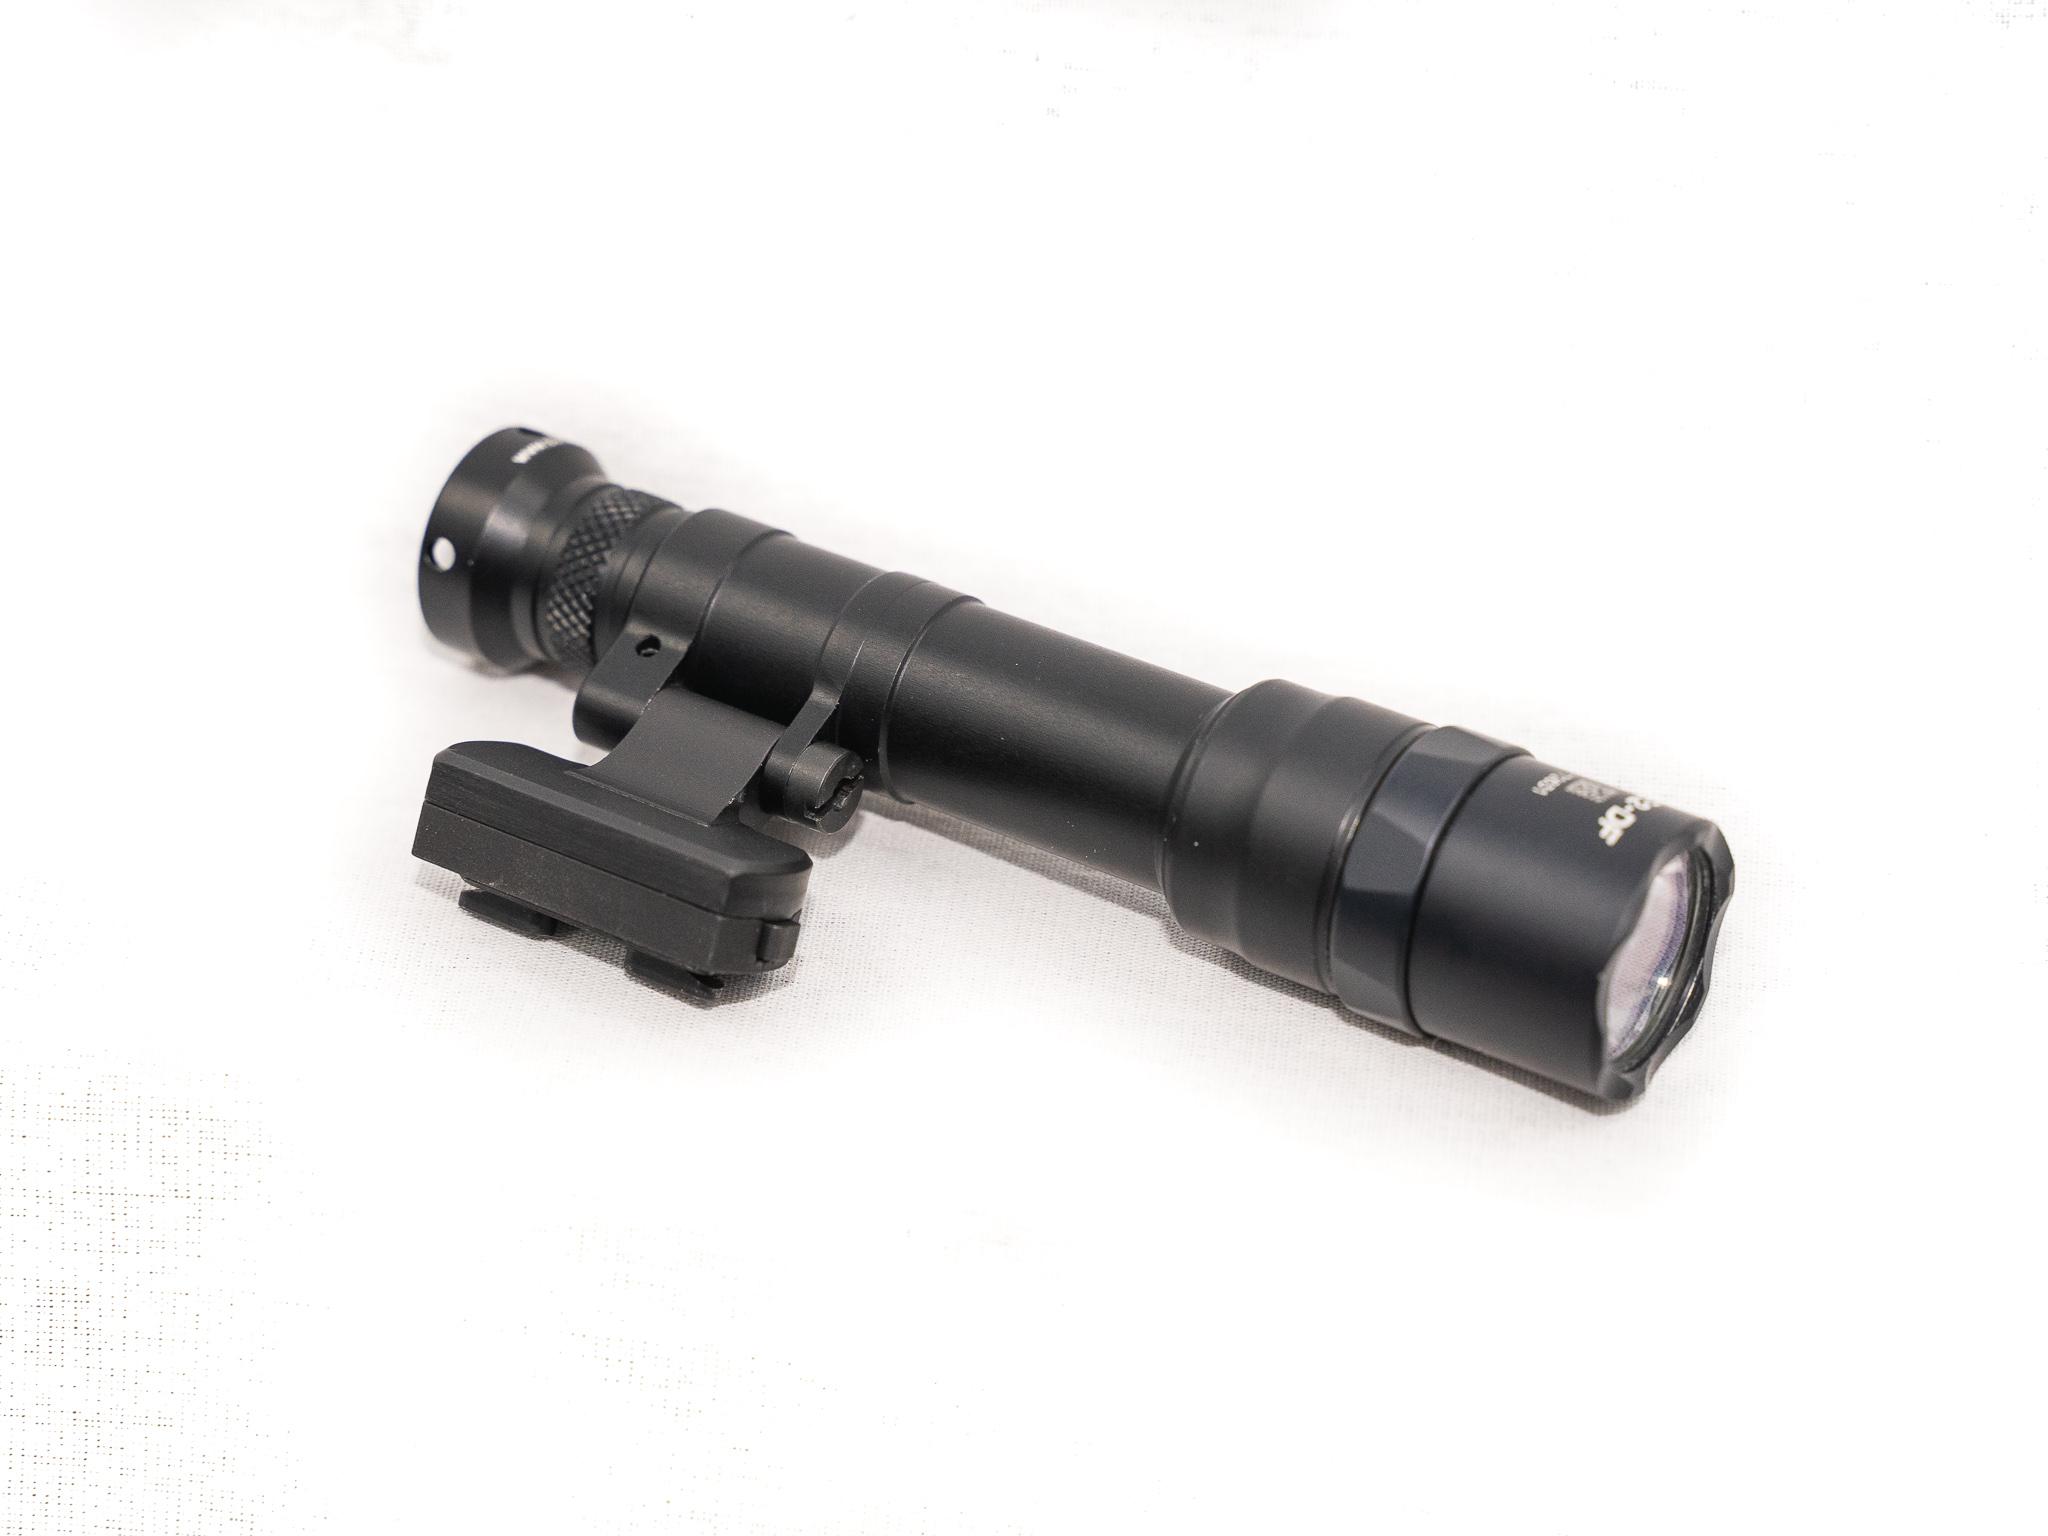 kinetic development group surefire scout light kinect qd mount weapon lights